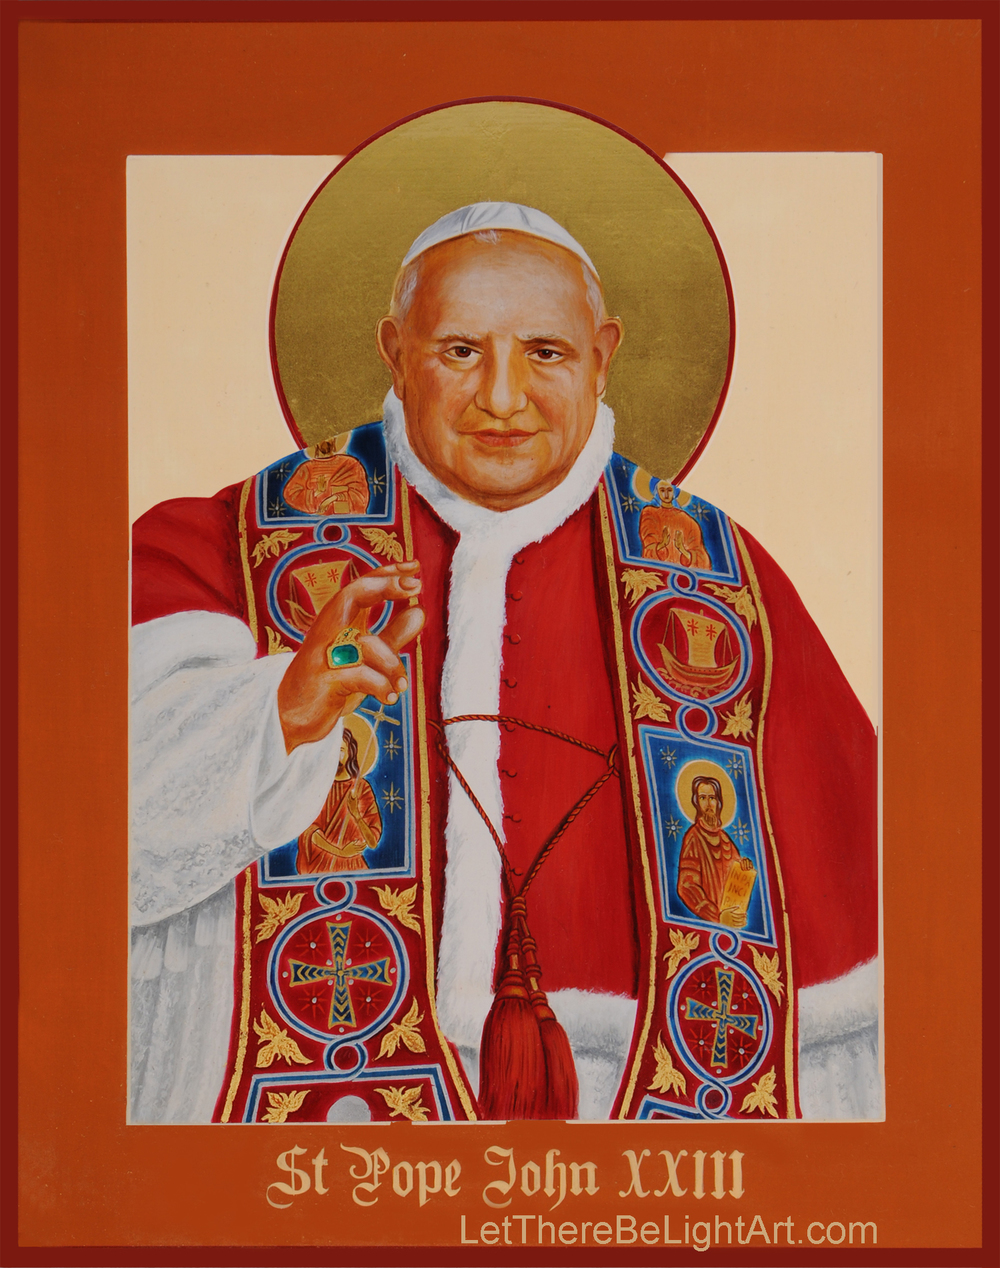 St Pope John XXIII